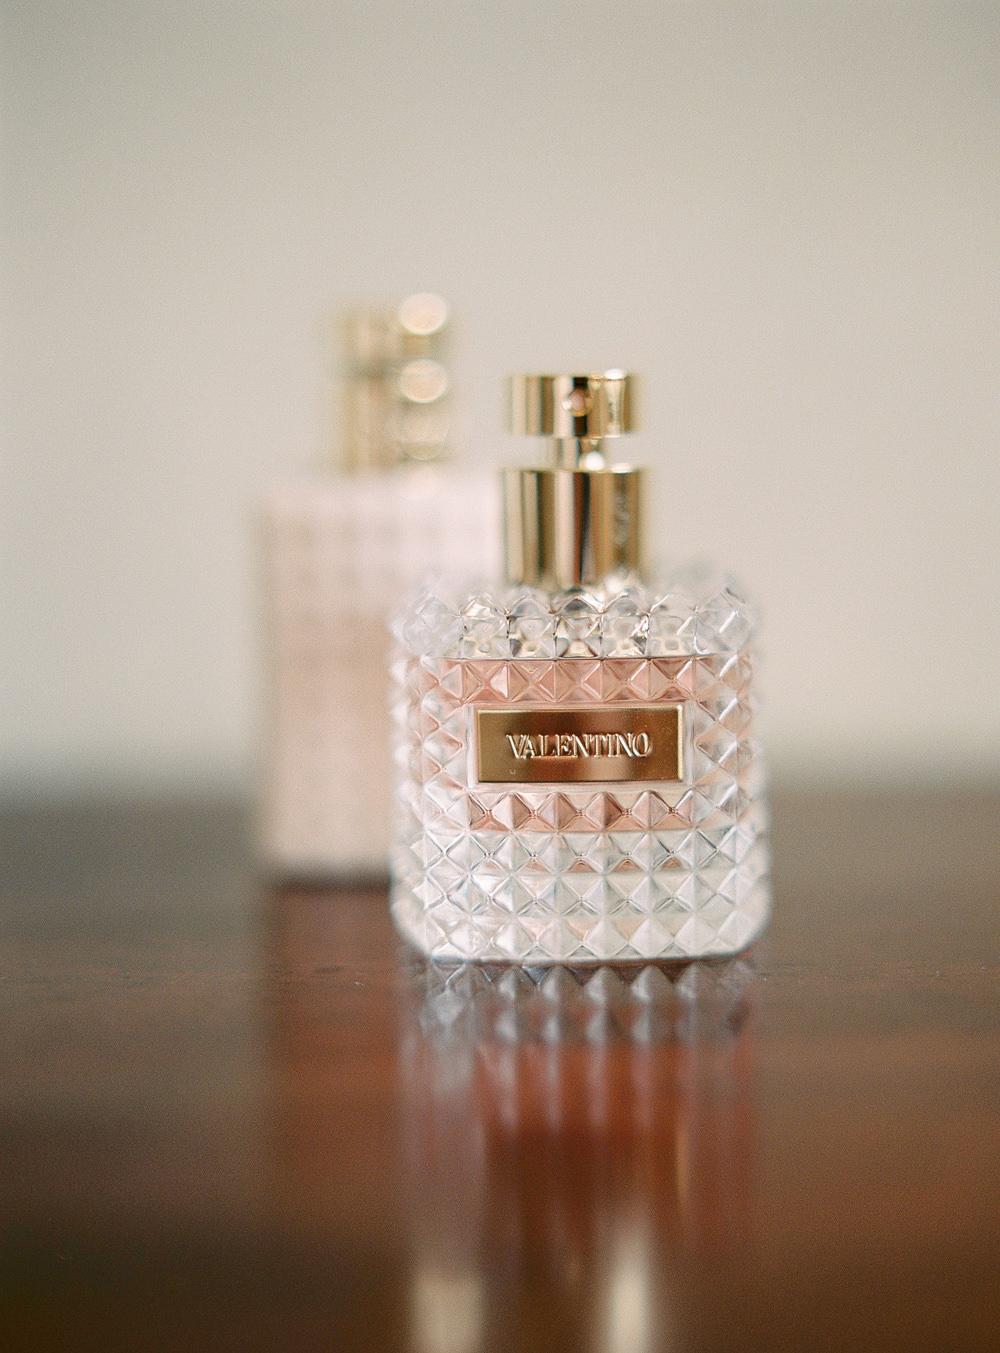 Valentino perfume bottle